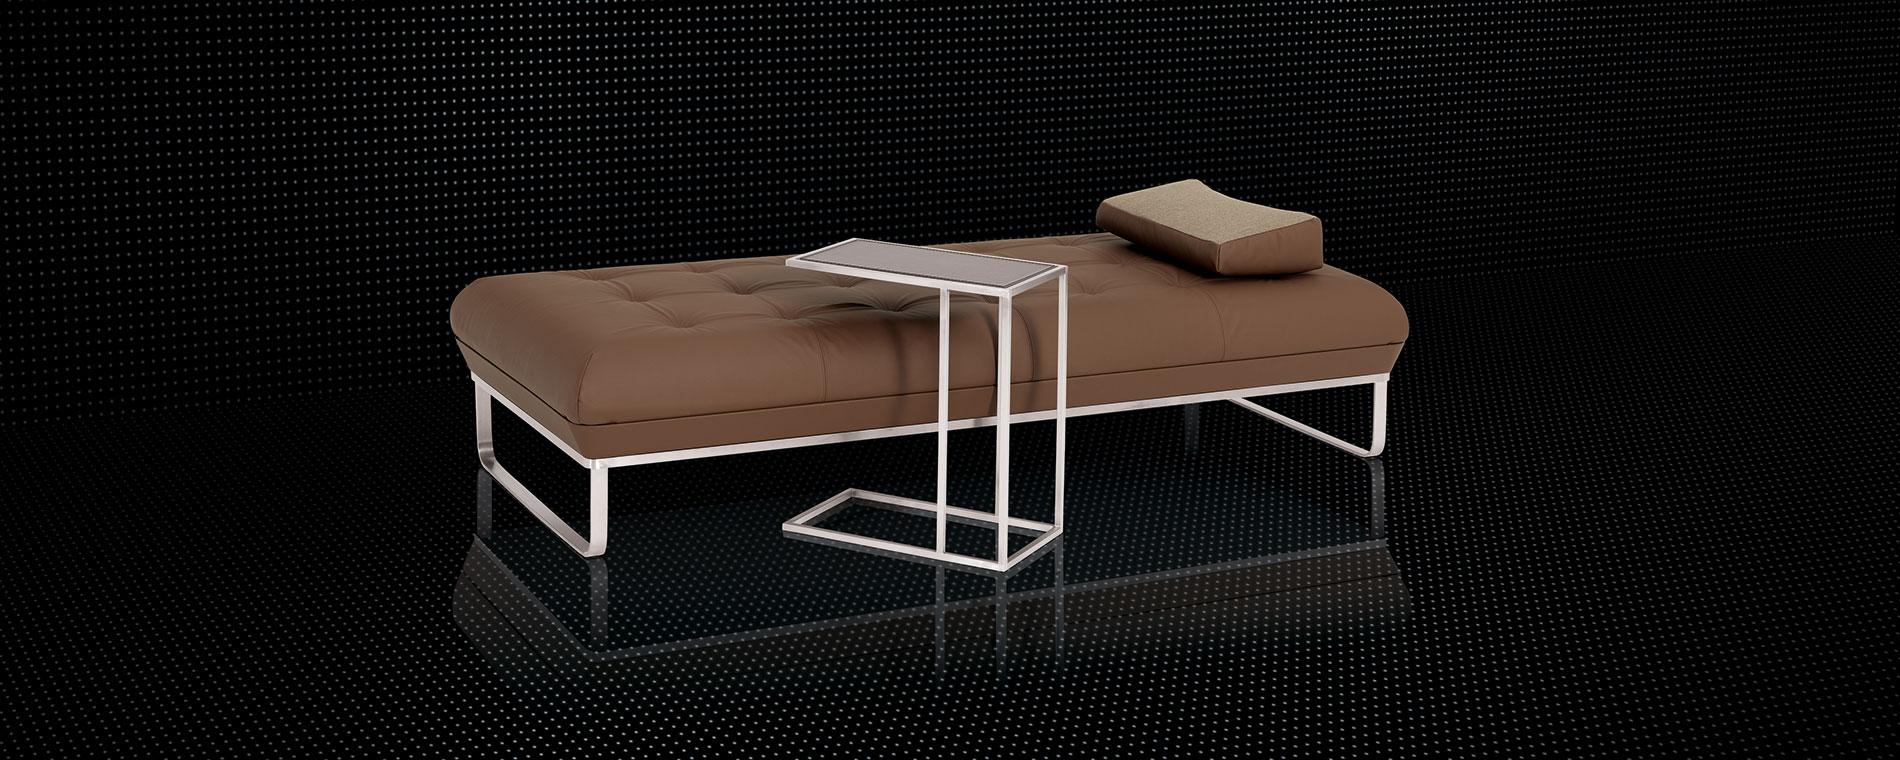 Die Tagesliege BED for LIVING Daybed in braunem Leder mit Clubtisch.